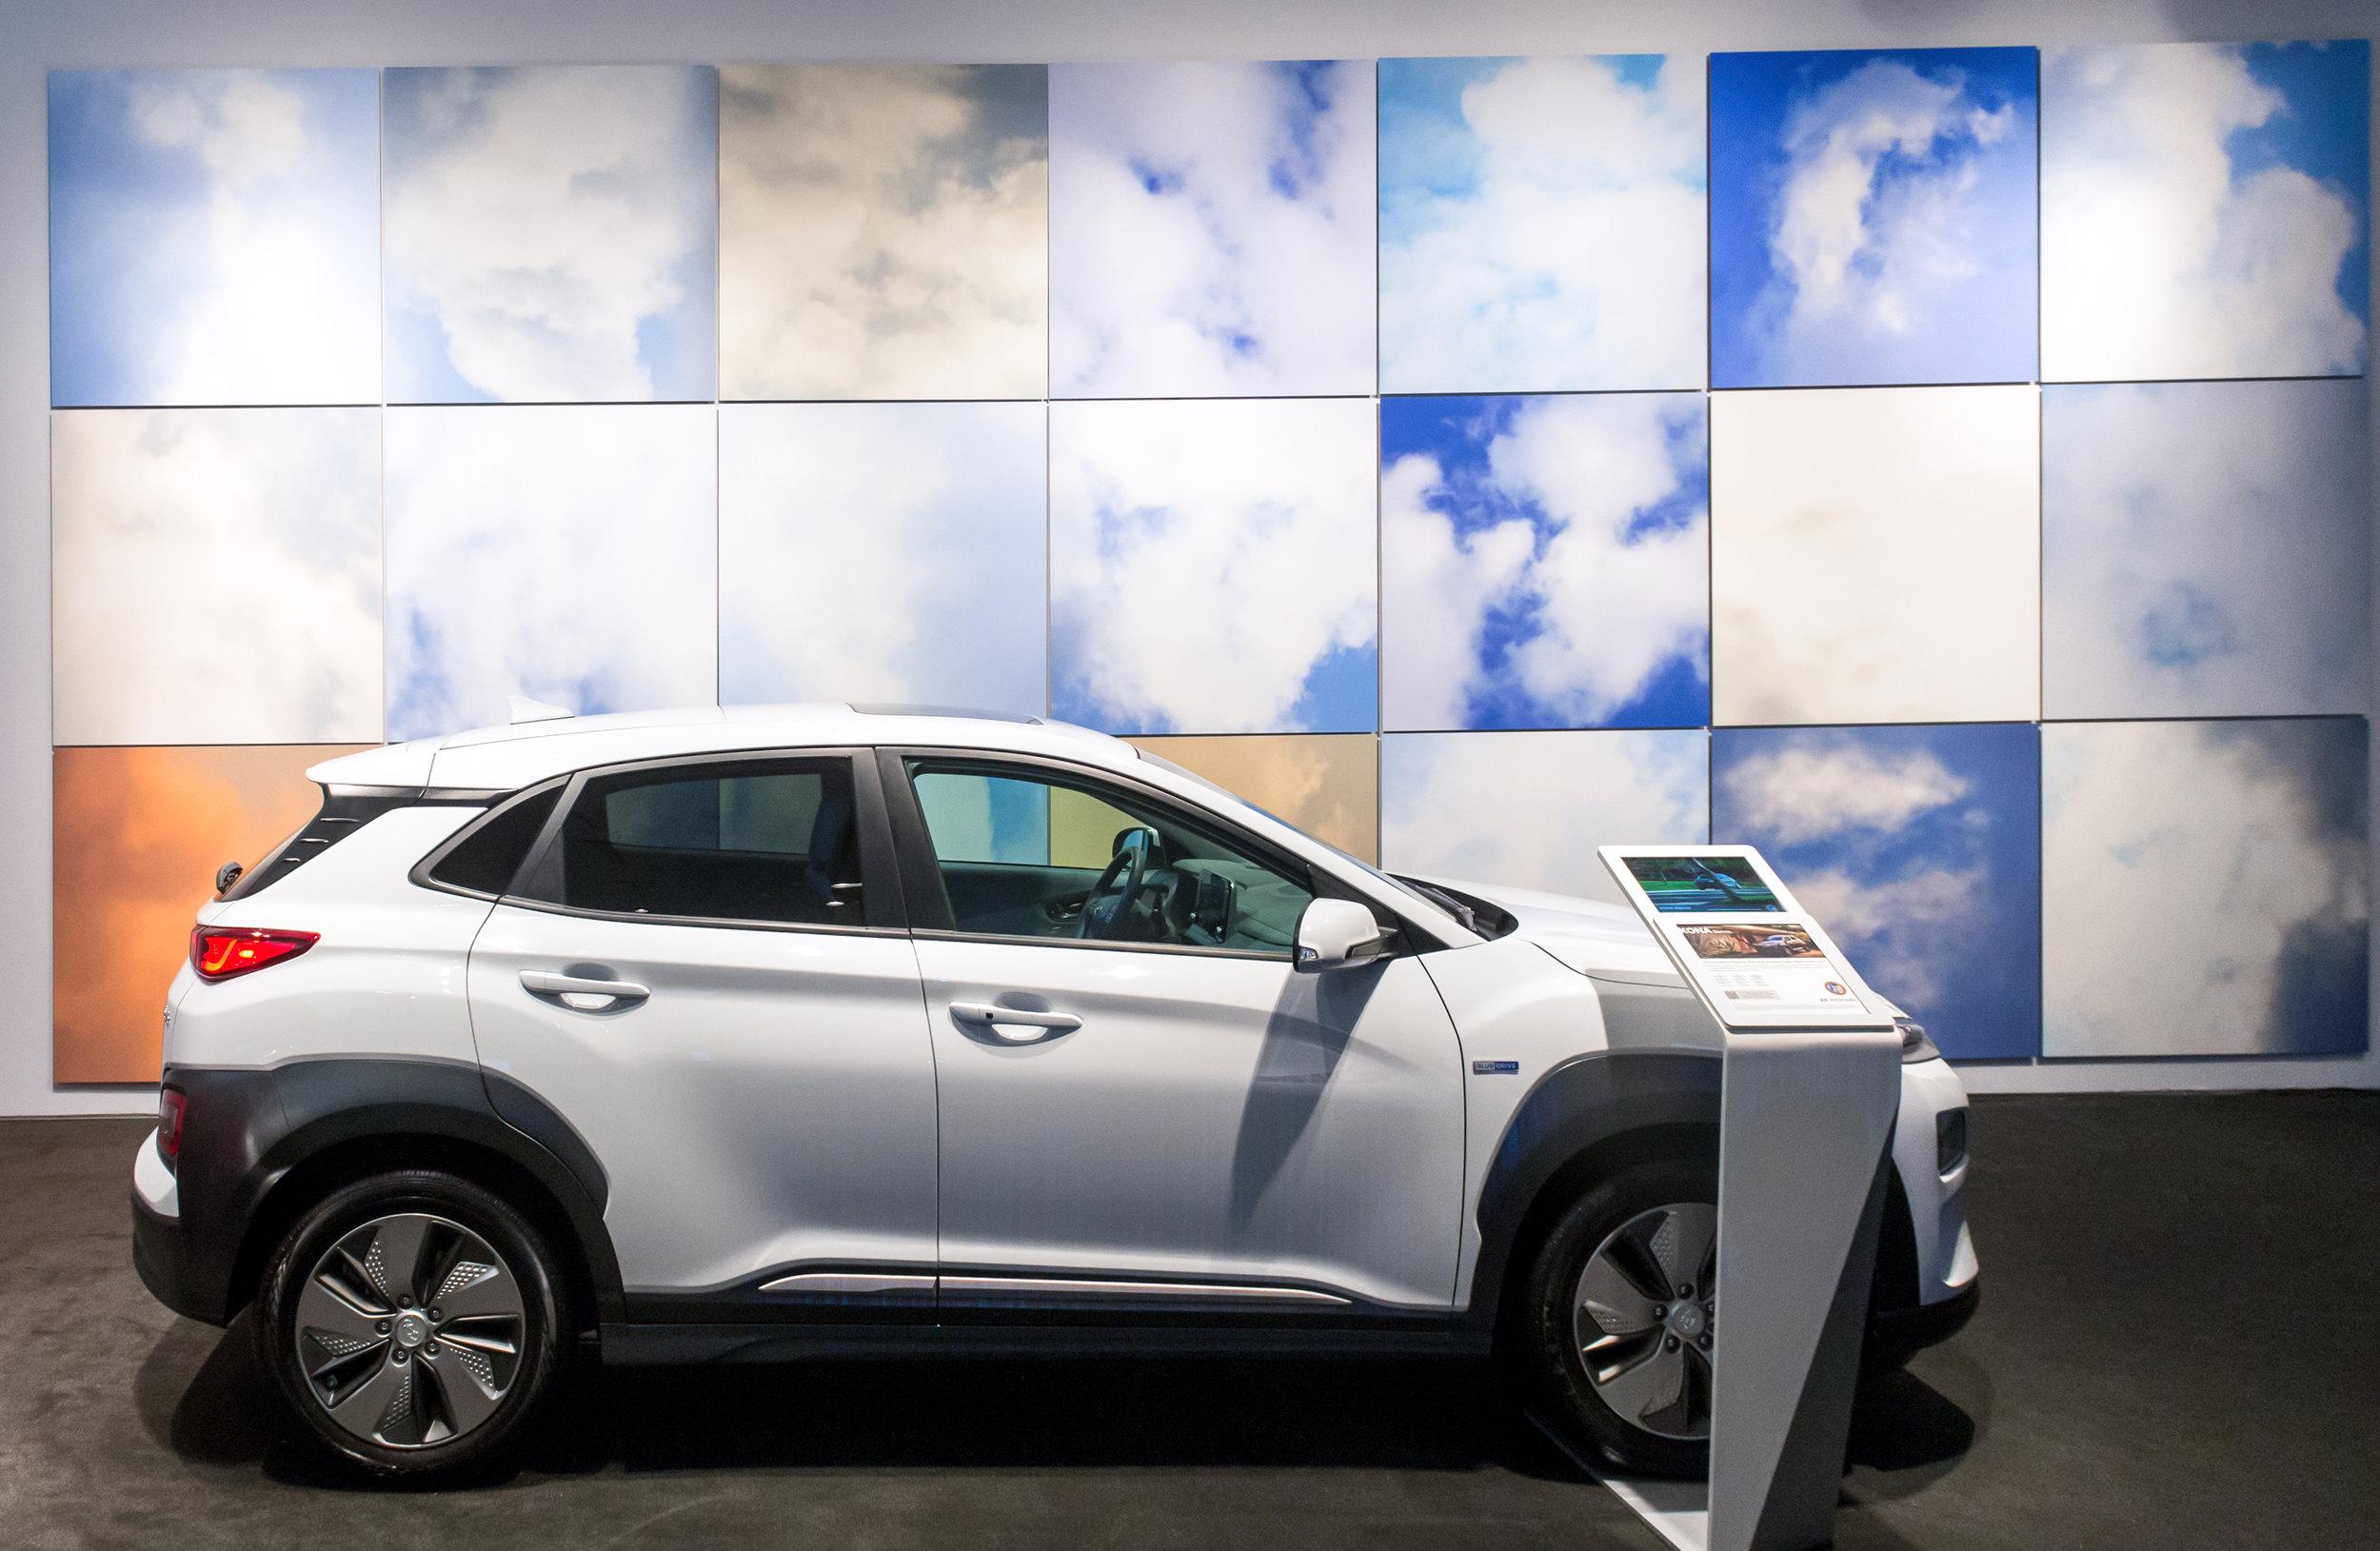 OHelloMedia-Hyundai-Christie'sAuctionHouse-TopSelect-29.jpg